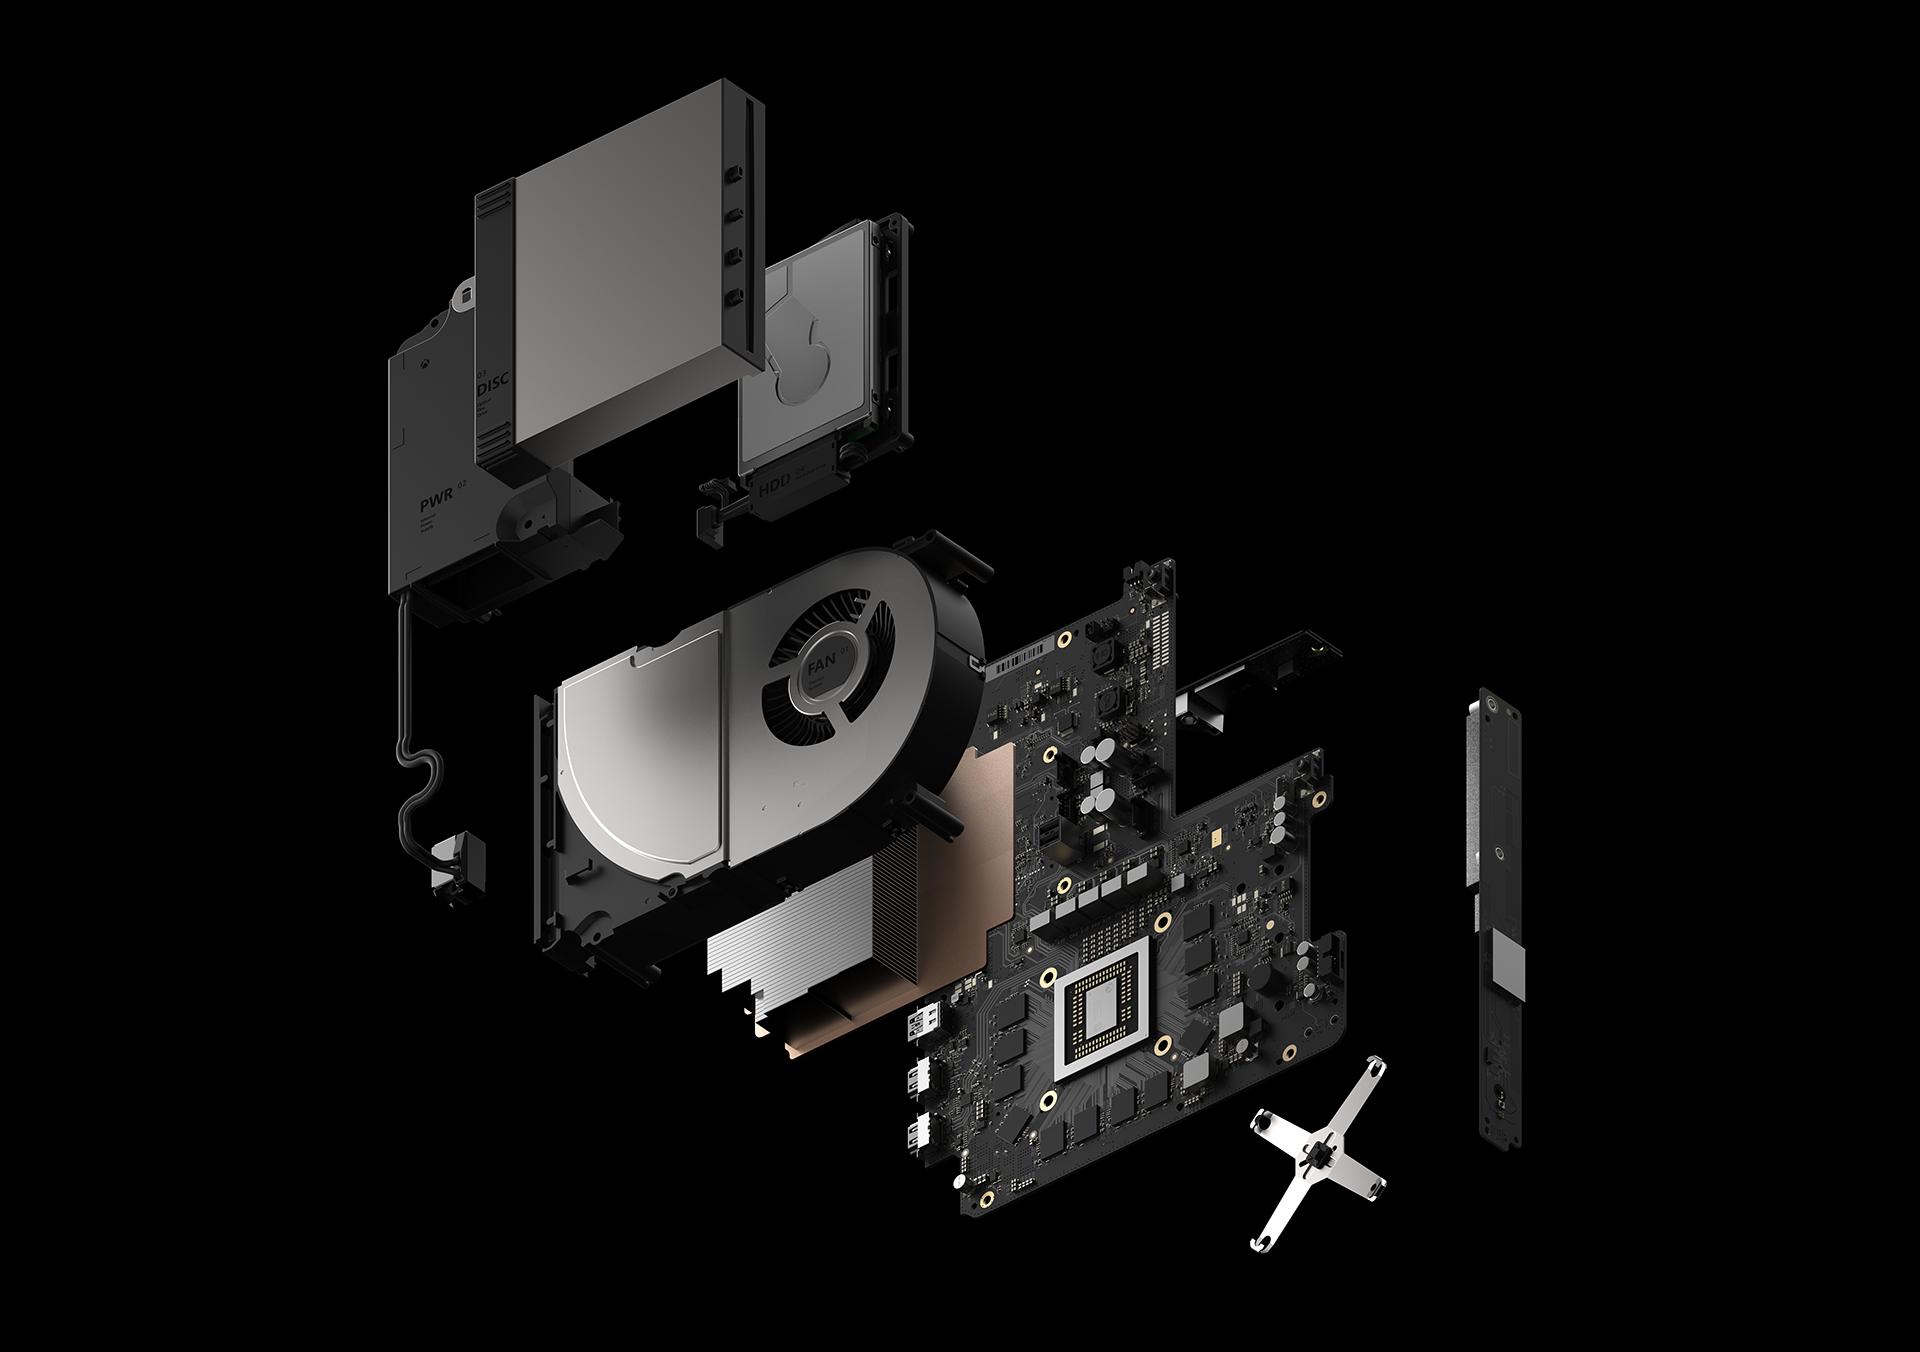 Xbox One Scorpio internals